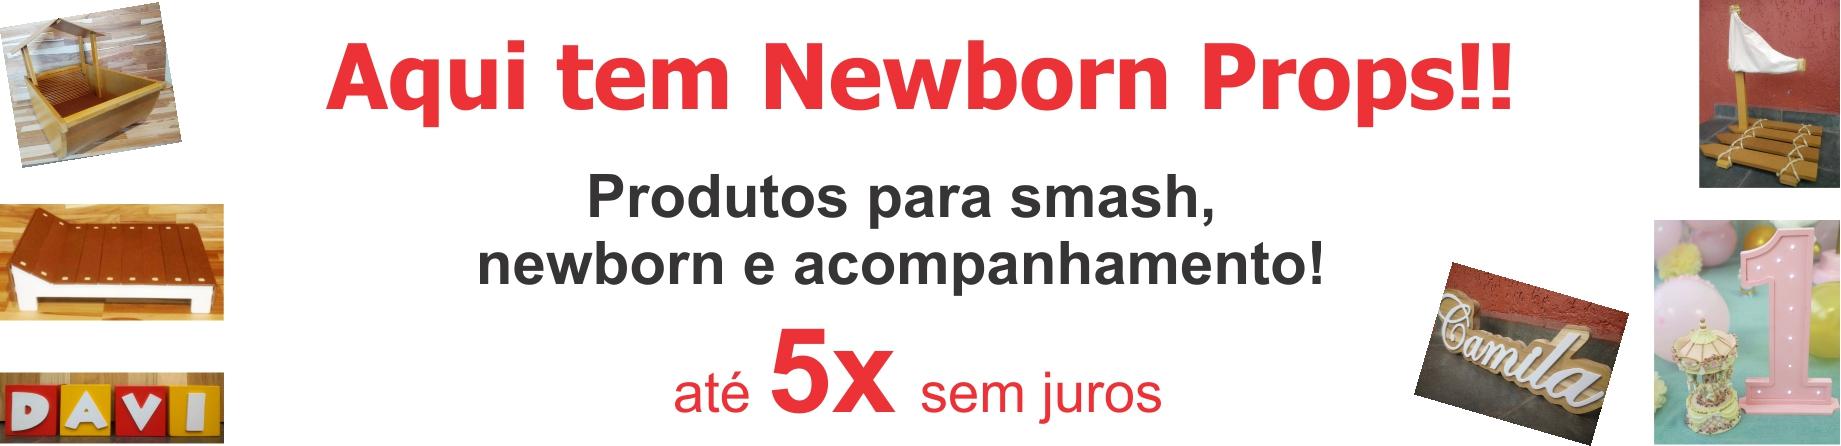 catalog/arteseletras/banner/Banner-Newborn-Props.jpg